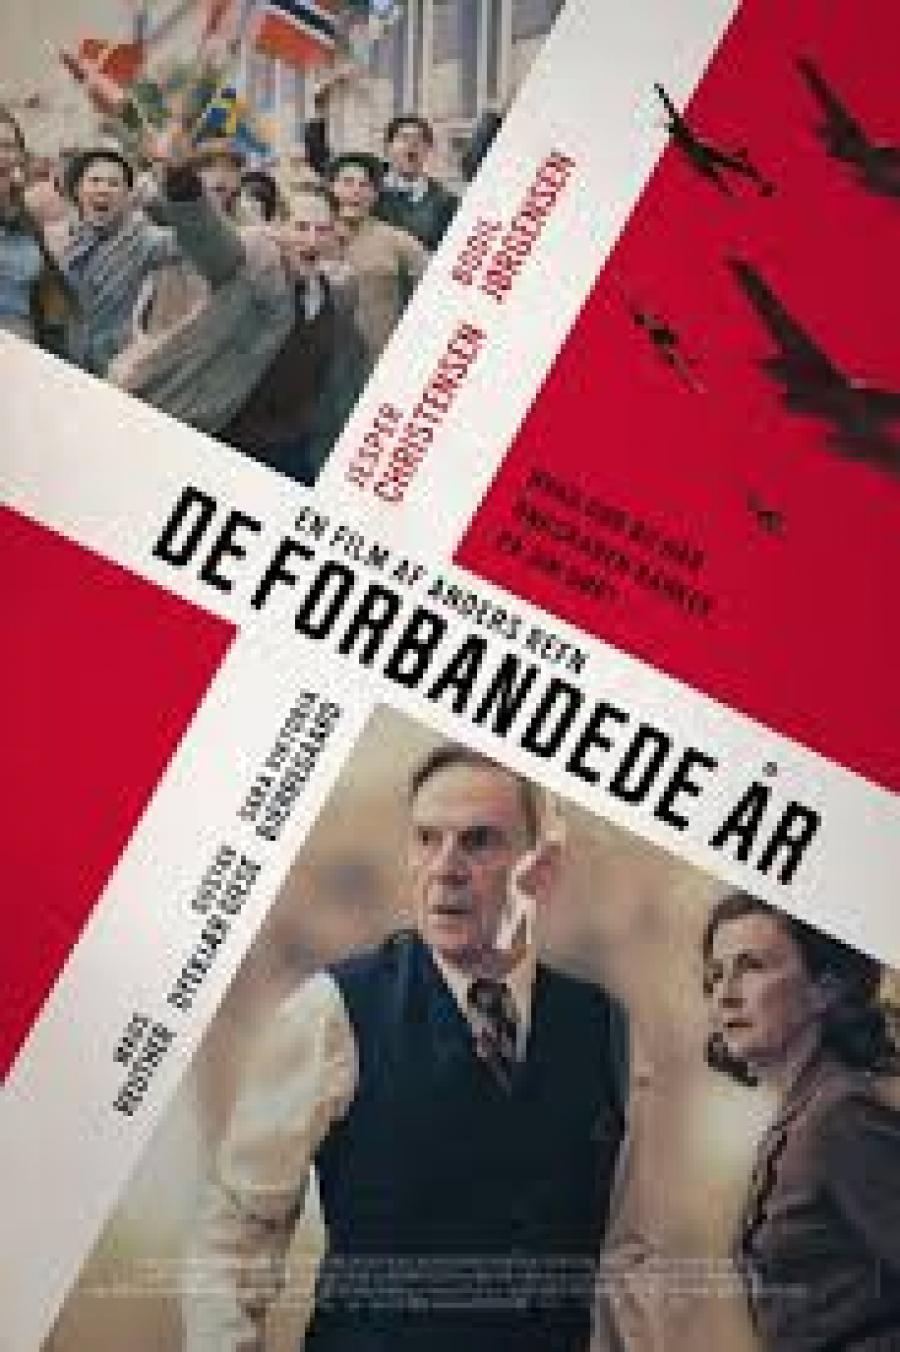 Biografplakat med den danske film De forbandede år